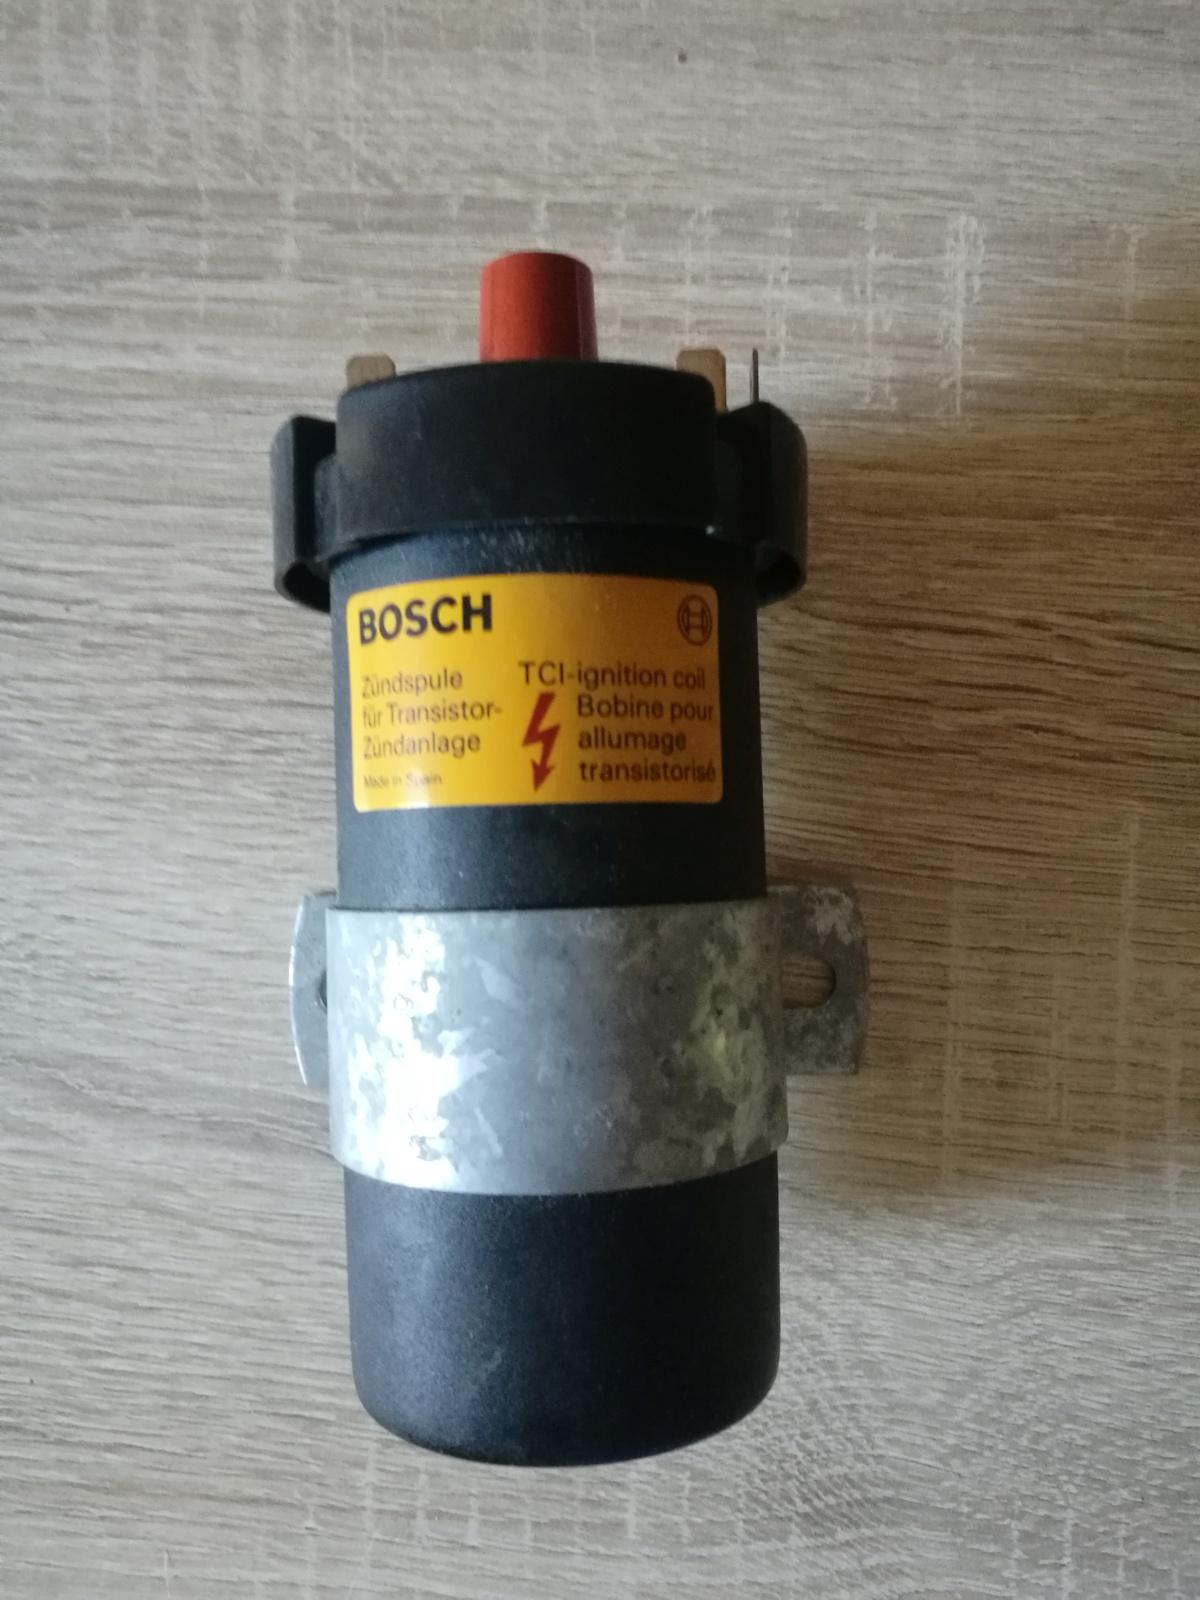 Bosch Zündspule 12 Volt 1220522016 bobina de encendido bobine d'allumage igniti